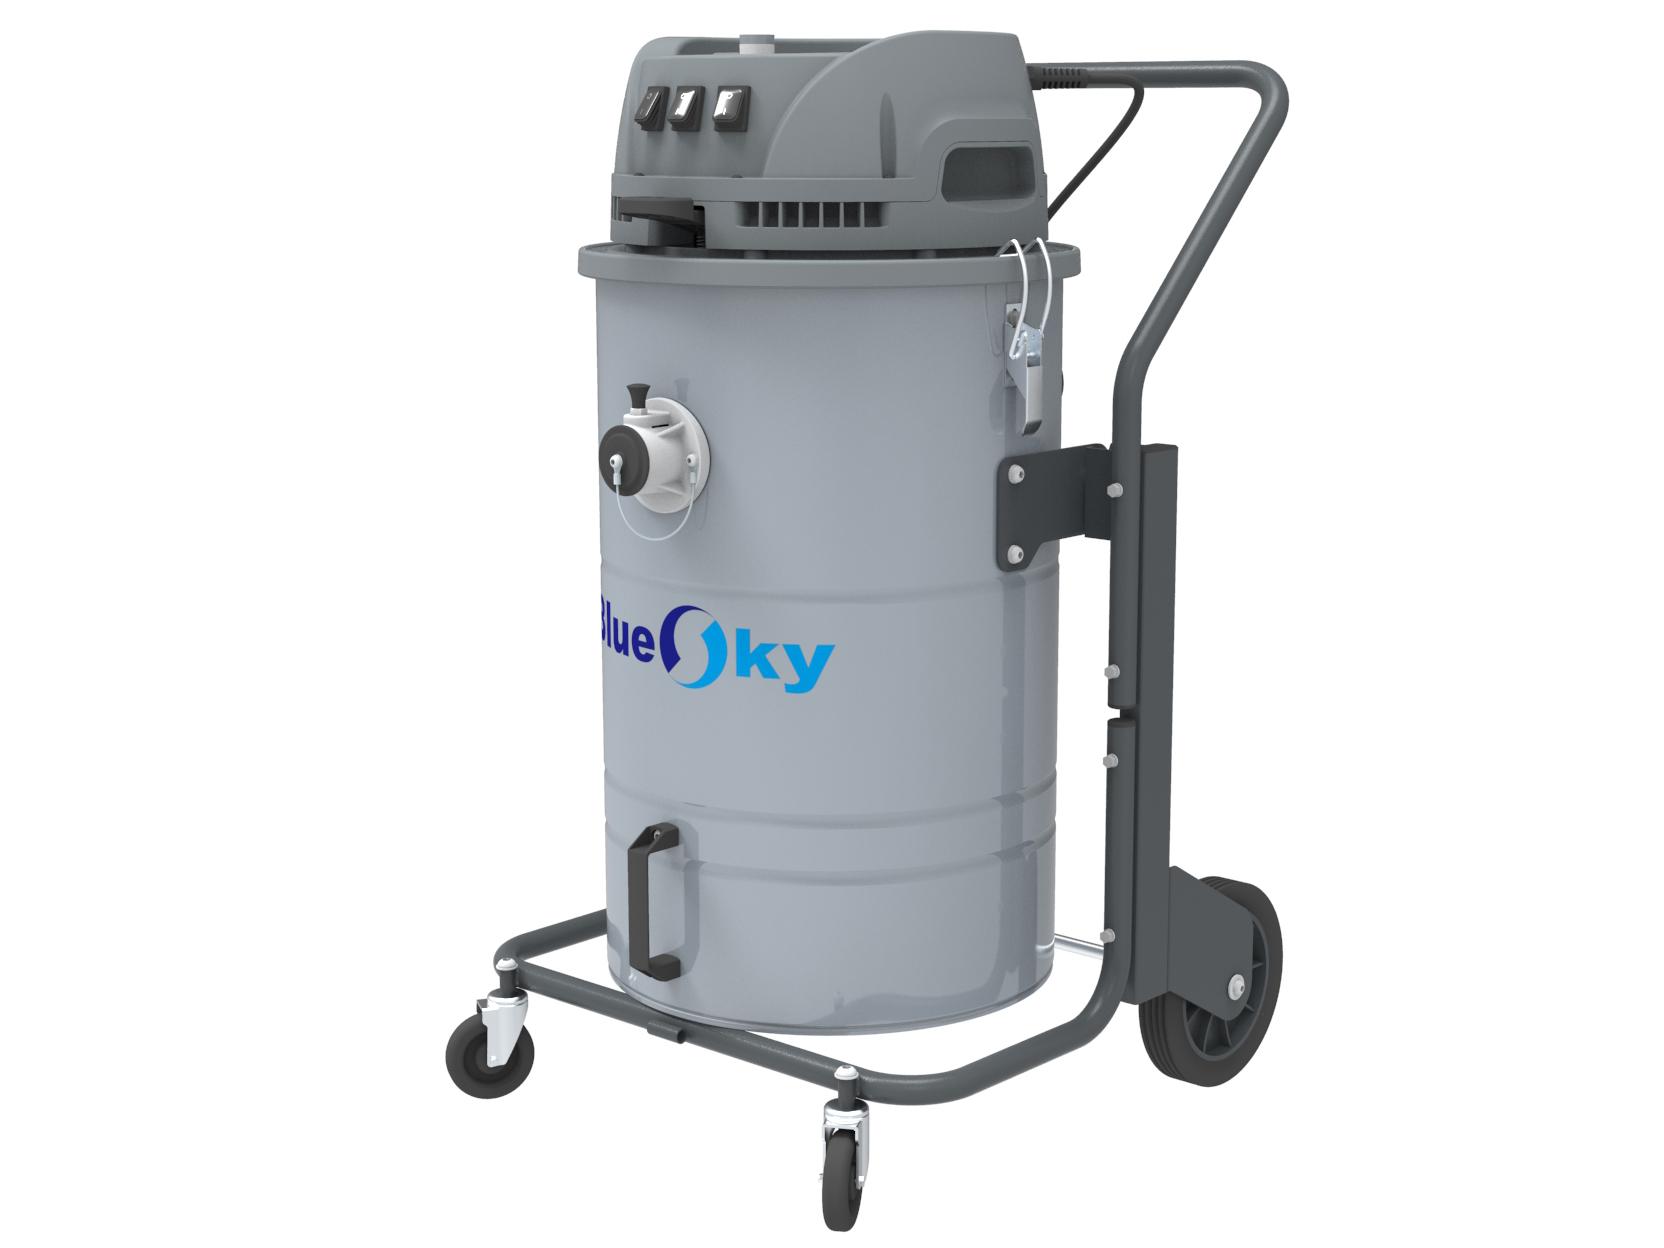 220V干湿两用单项电工业吸尘器